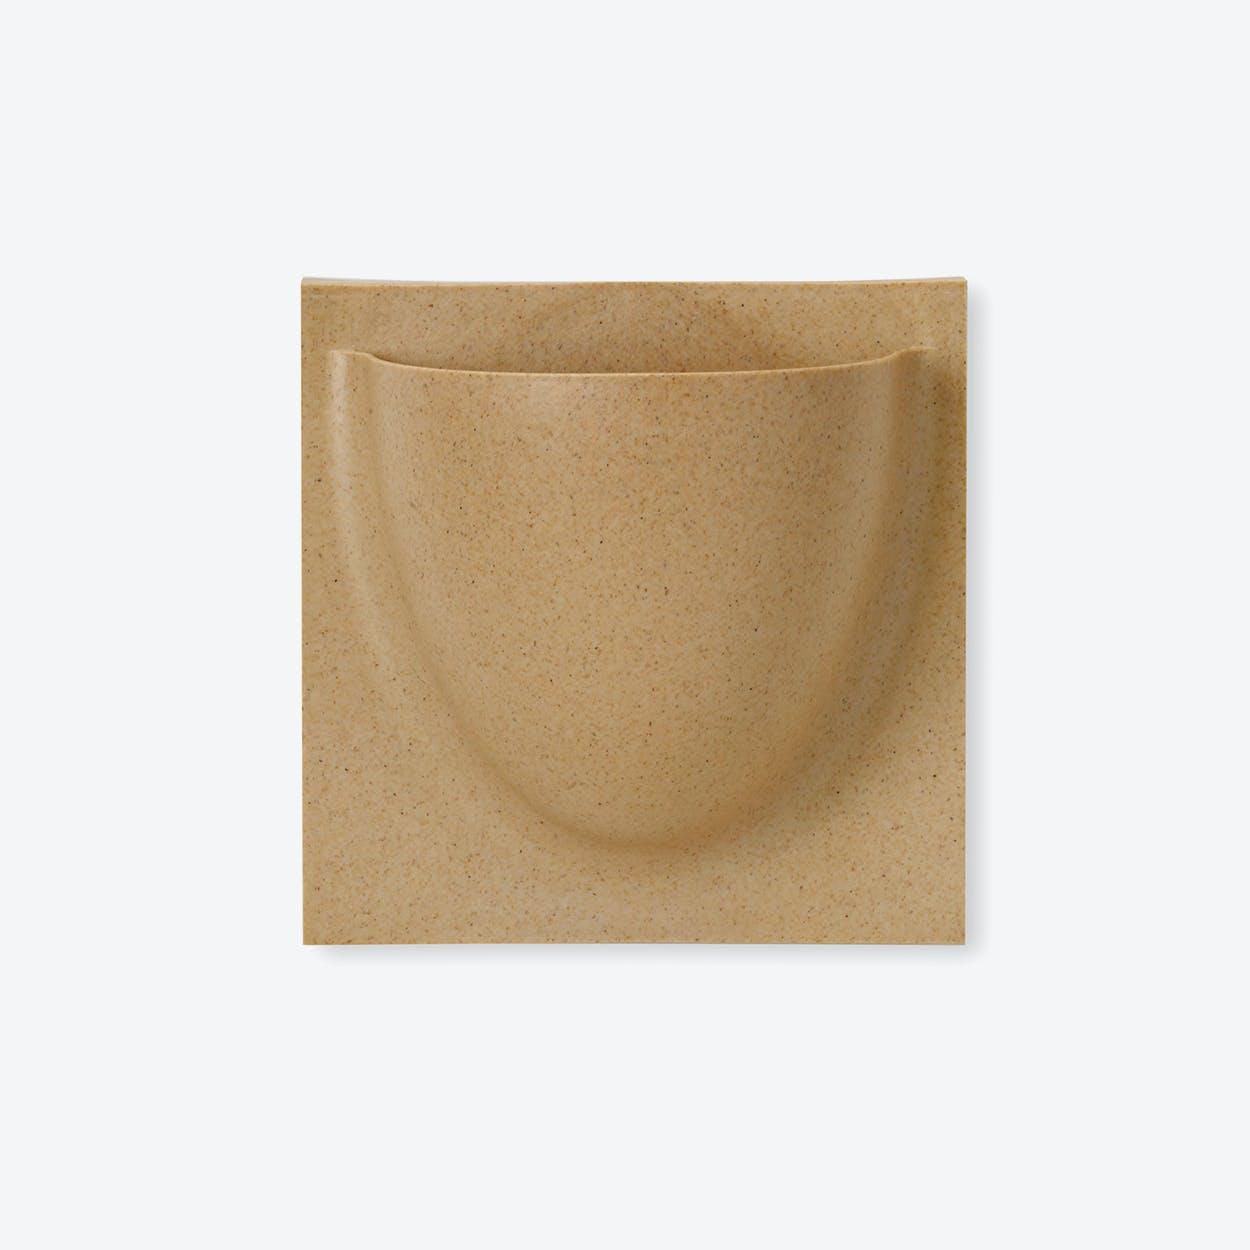 Wall Planter / Jar Mini in Cafe Latte (Biofiber) (Set of 2)